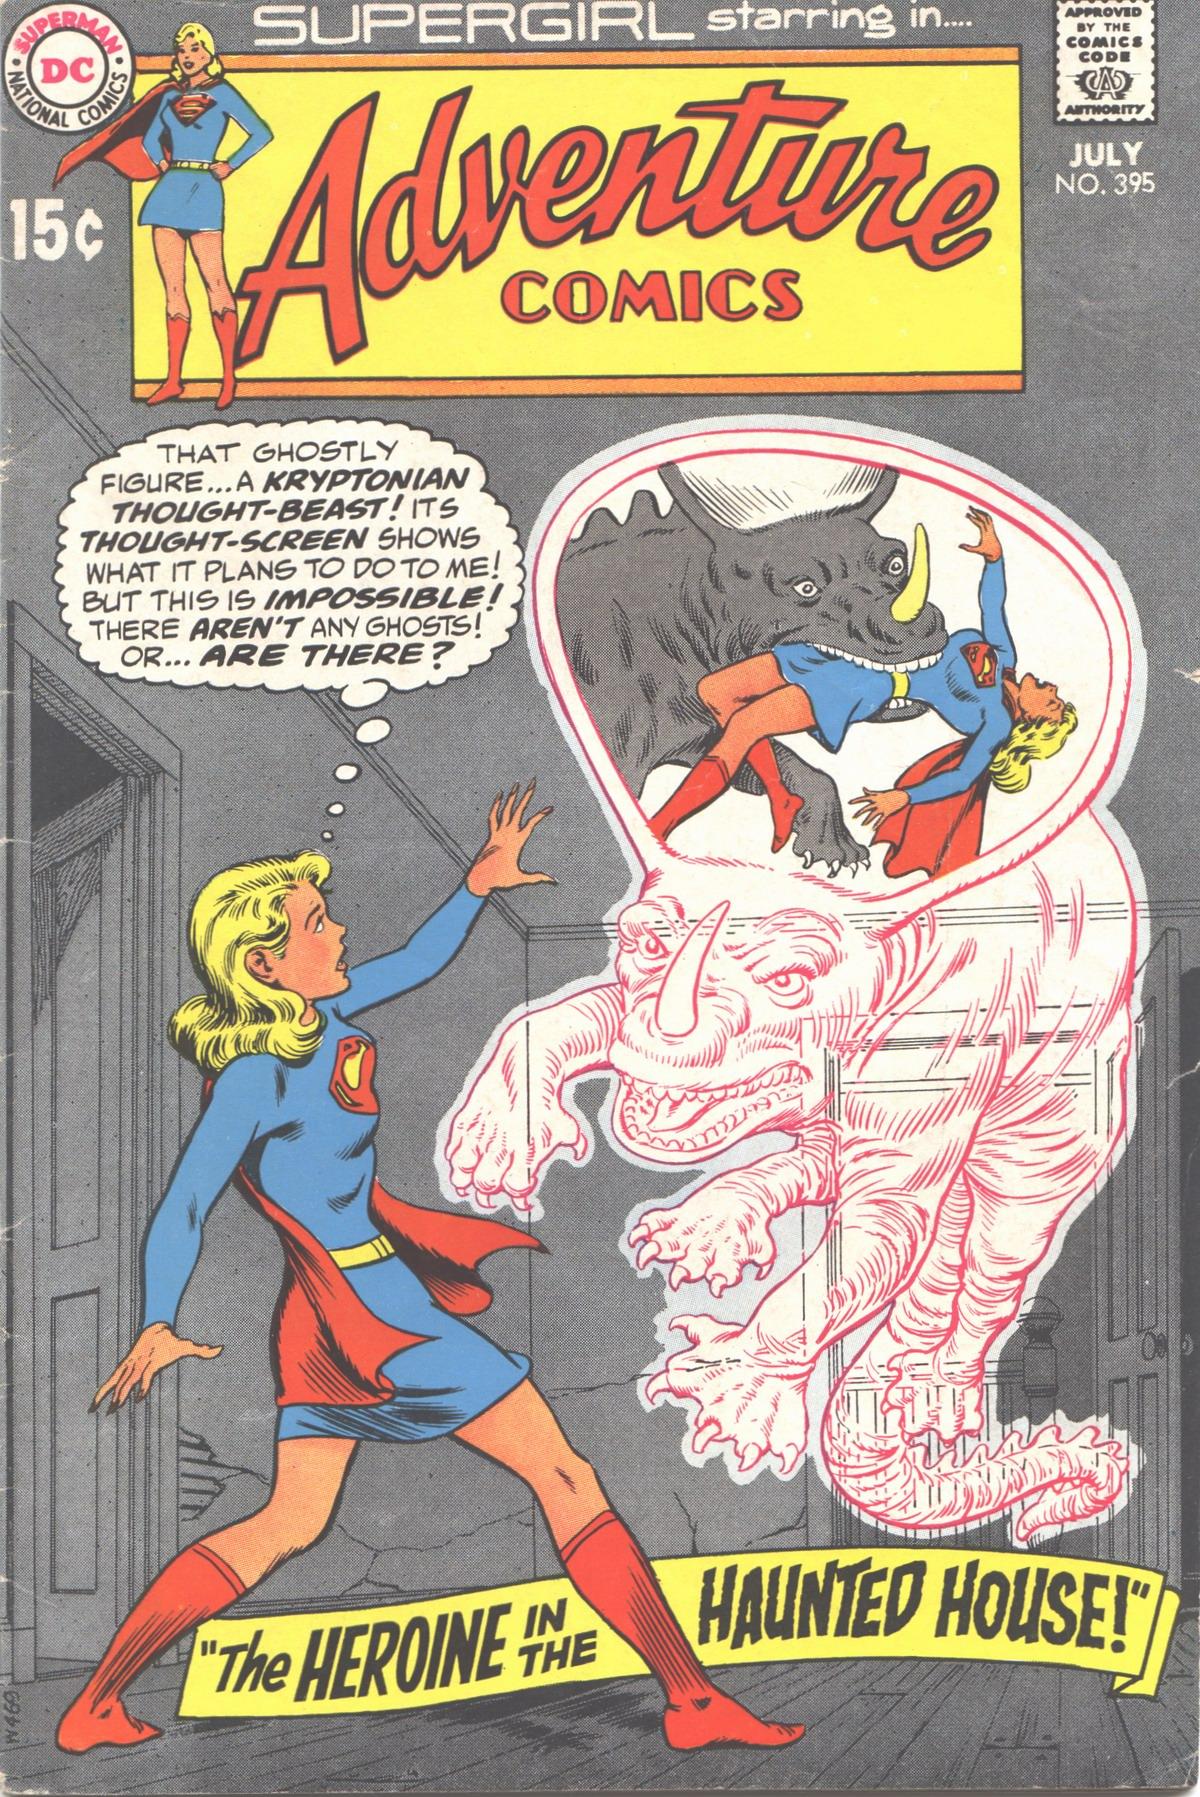 Read online Adventure Comics (1938) comic -  Issue #395 - 1